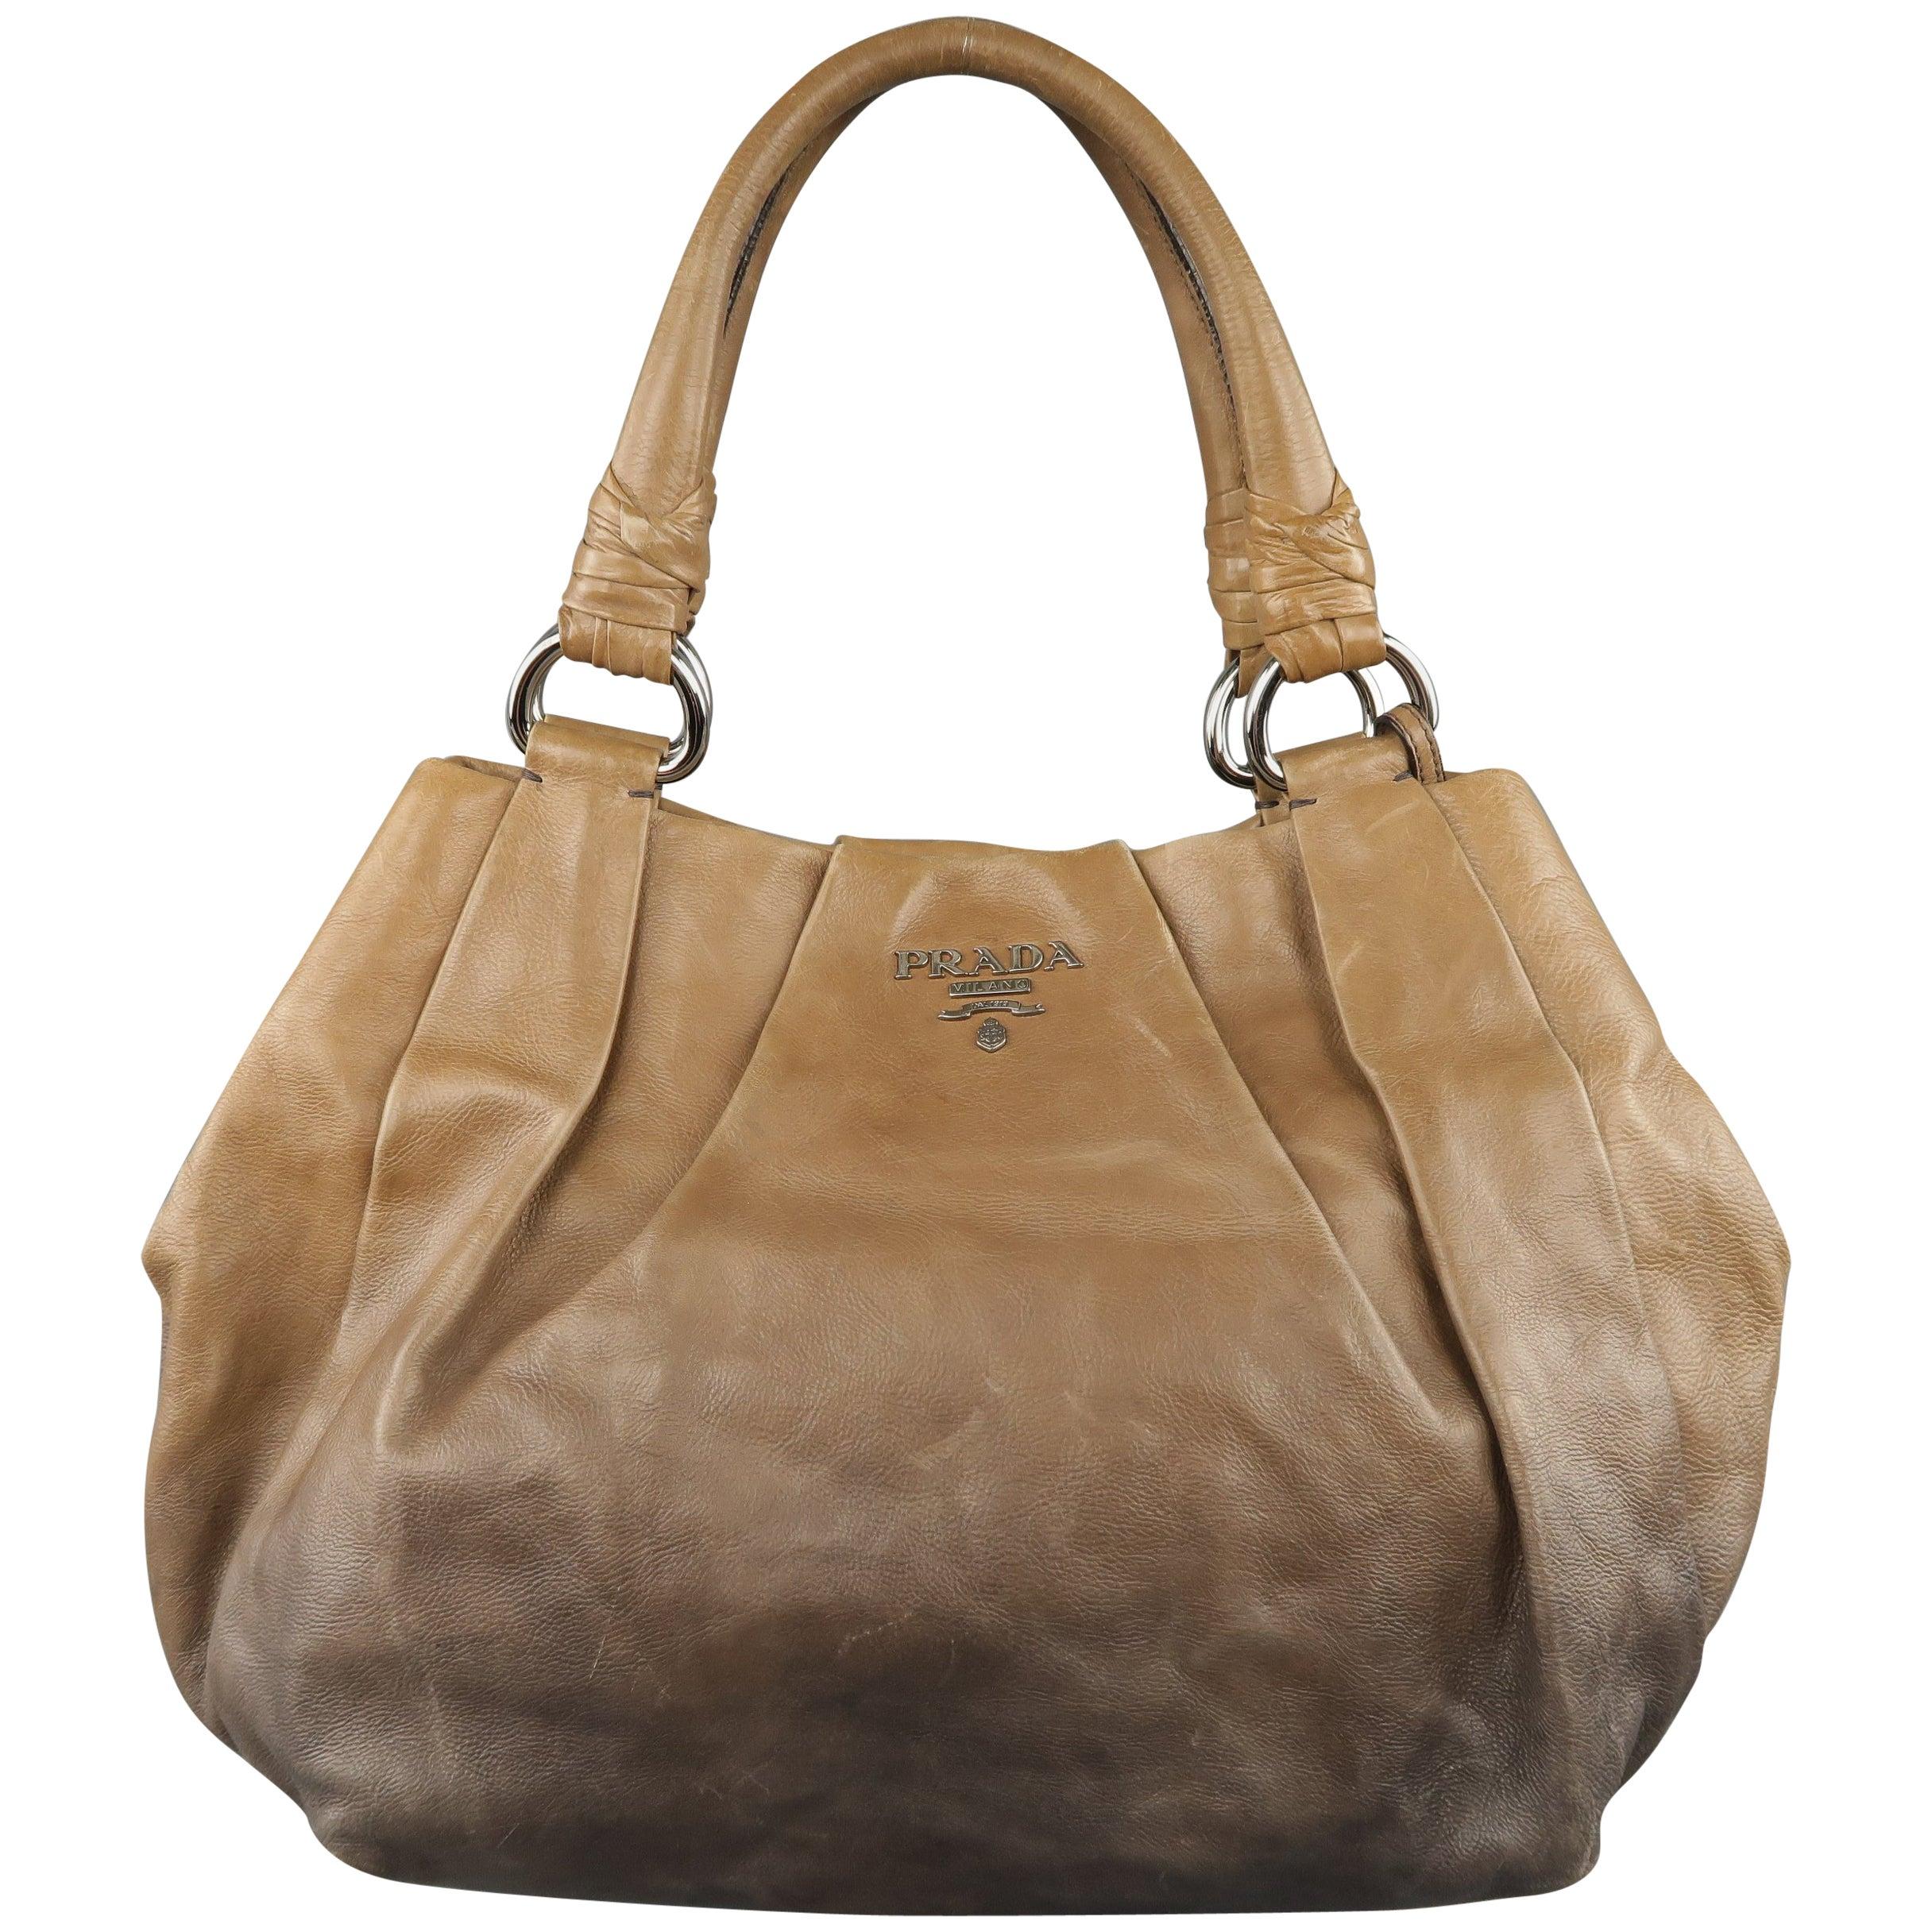 3c9063f37d PRADA Taupe Ombre Leather Degrade Blond Mordor Glace Handbag For Sale at  1stdibs